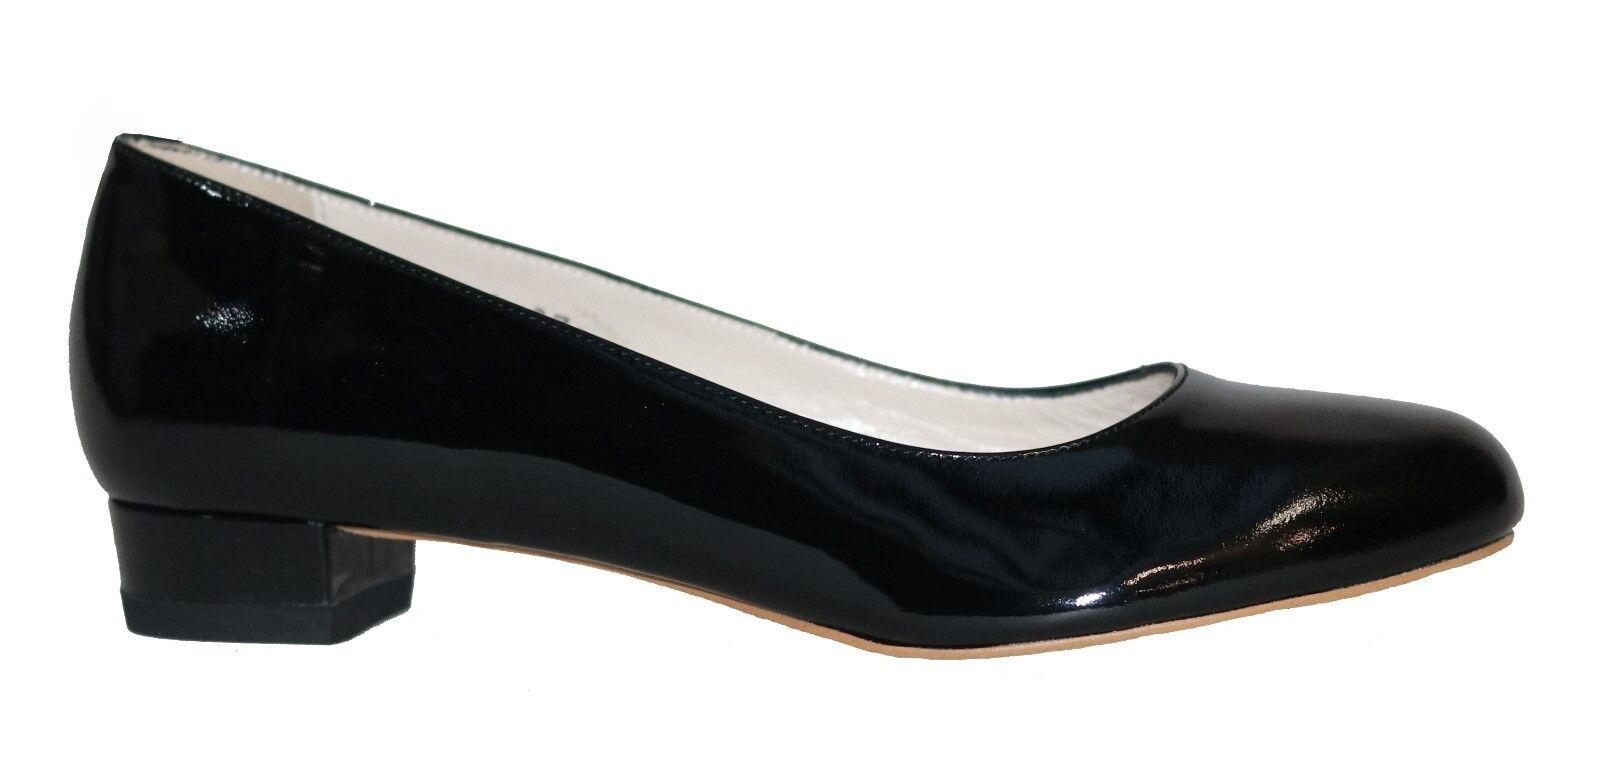 Muga Damen Schuhe Ballerina Gr.38 Schwarz